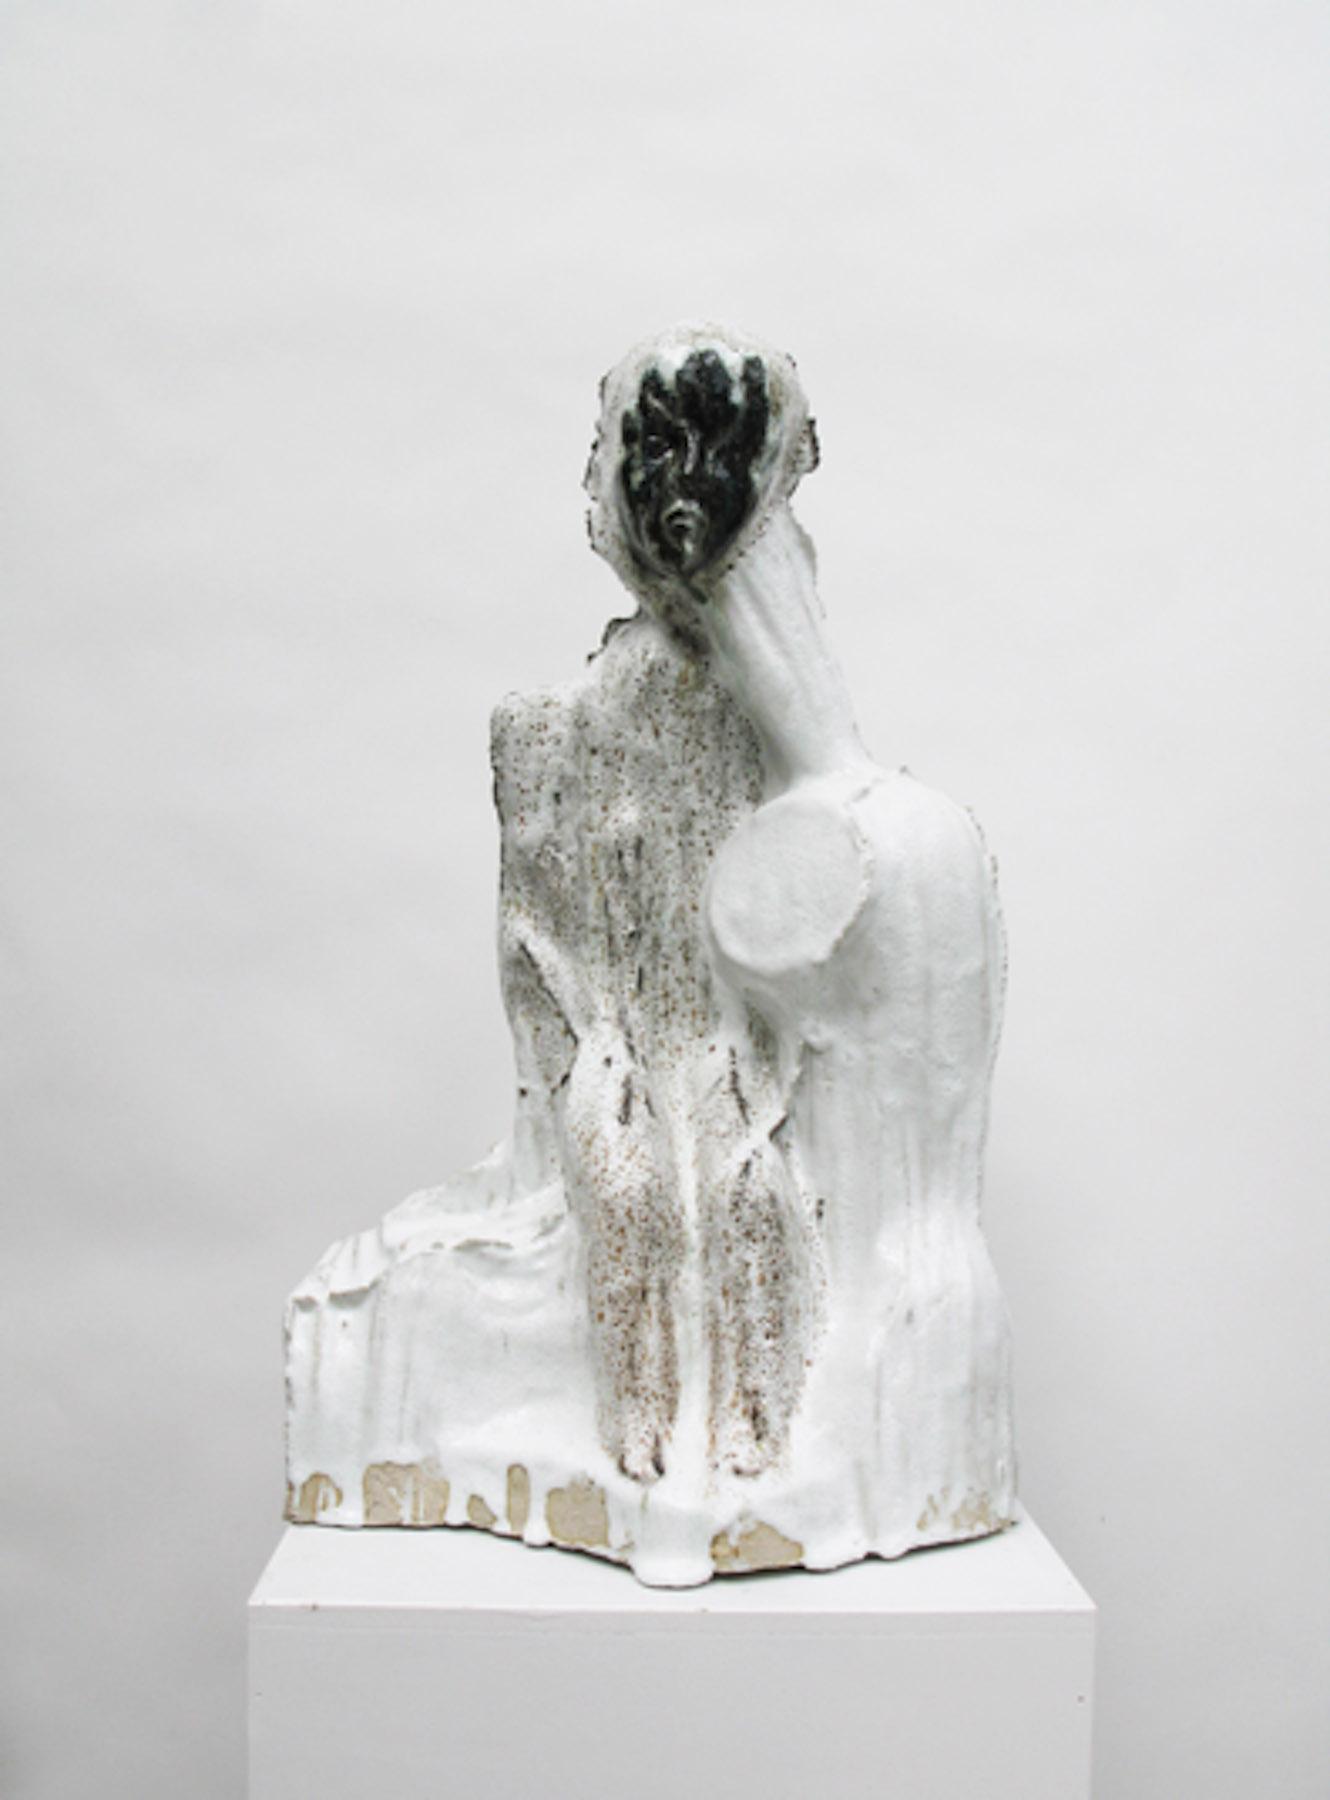 Salt Seeder II, 2011